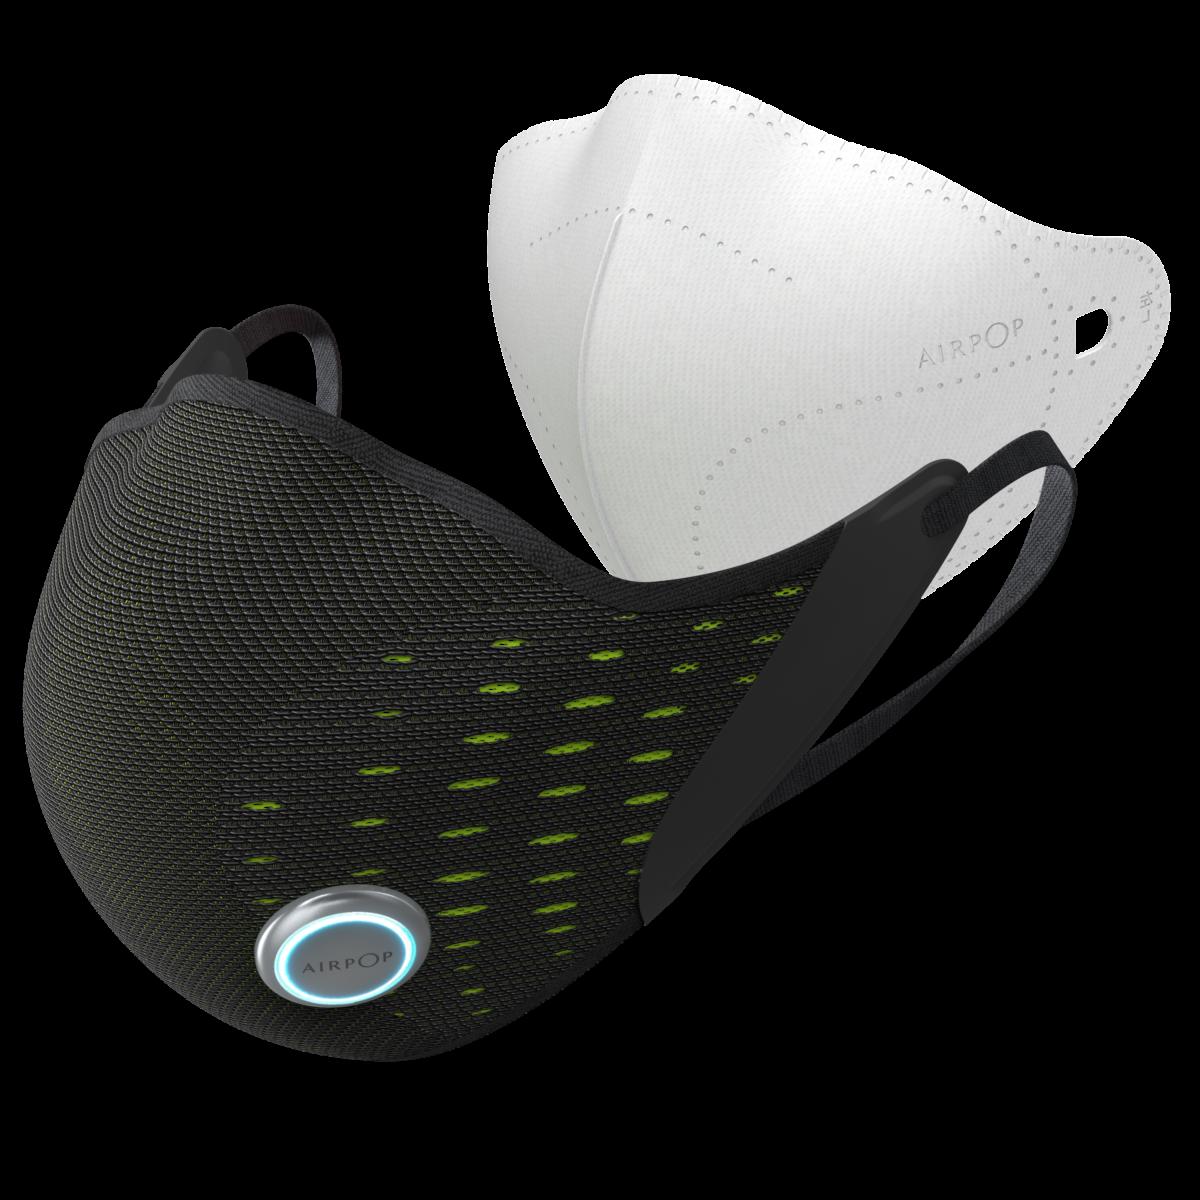 Le masque AirPop Active+ avec son filtre